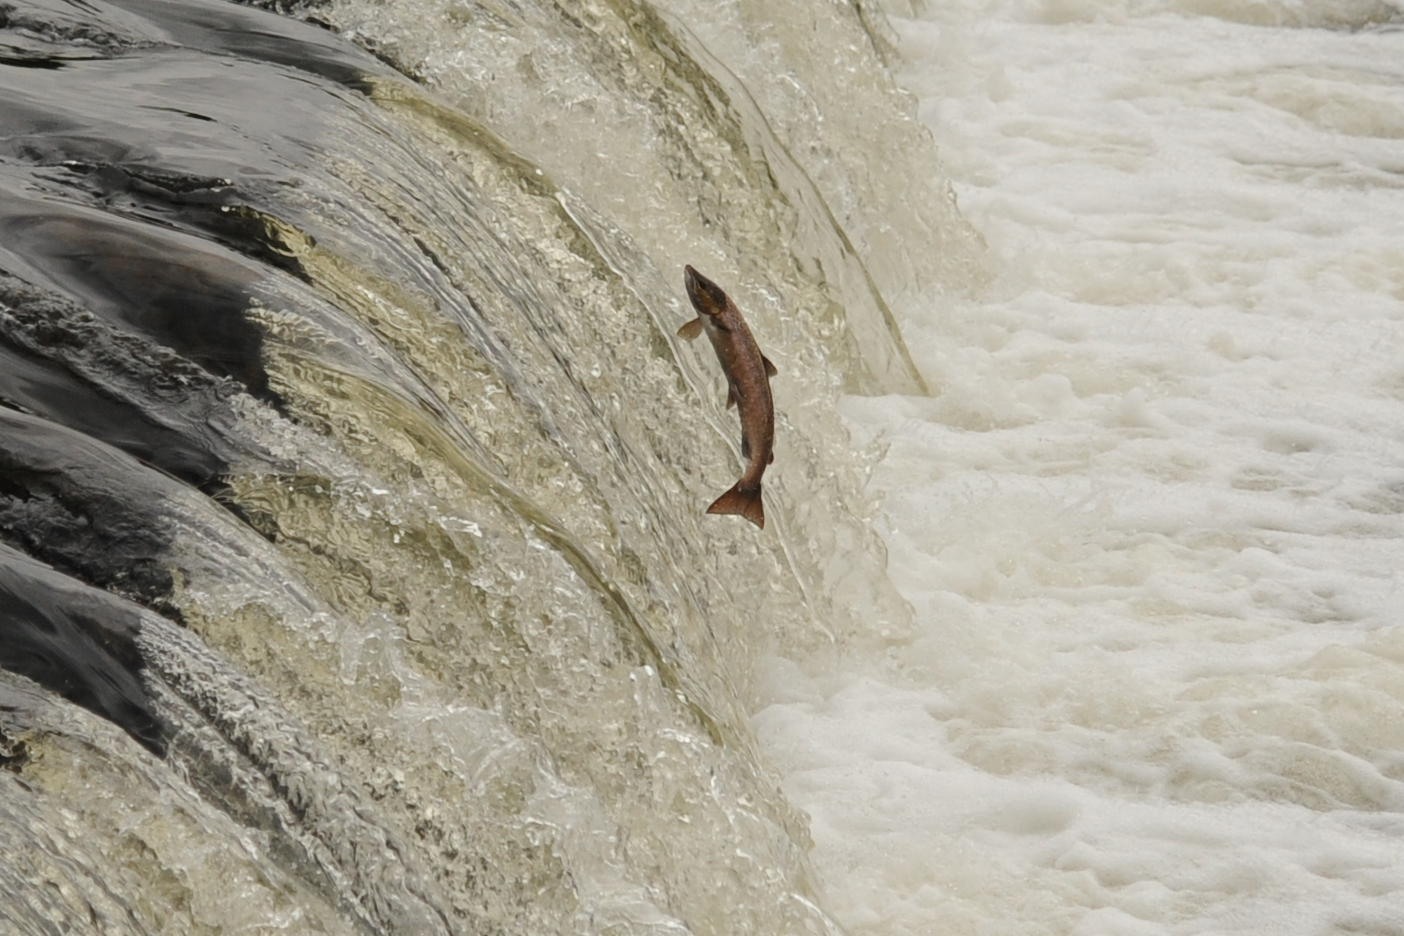 Die Lachse Springen...!